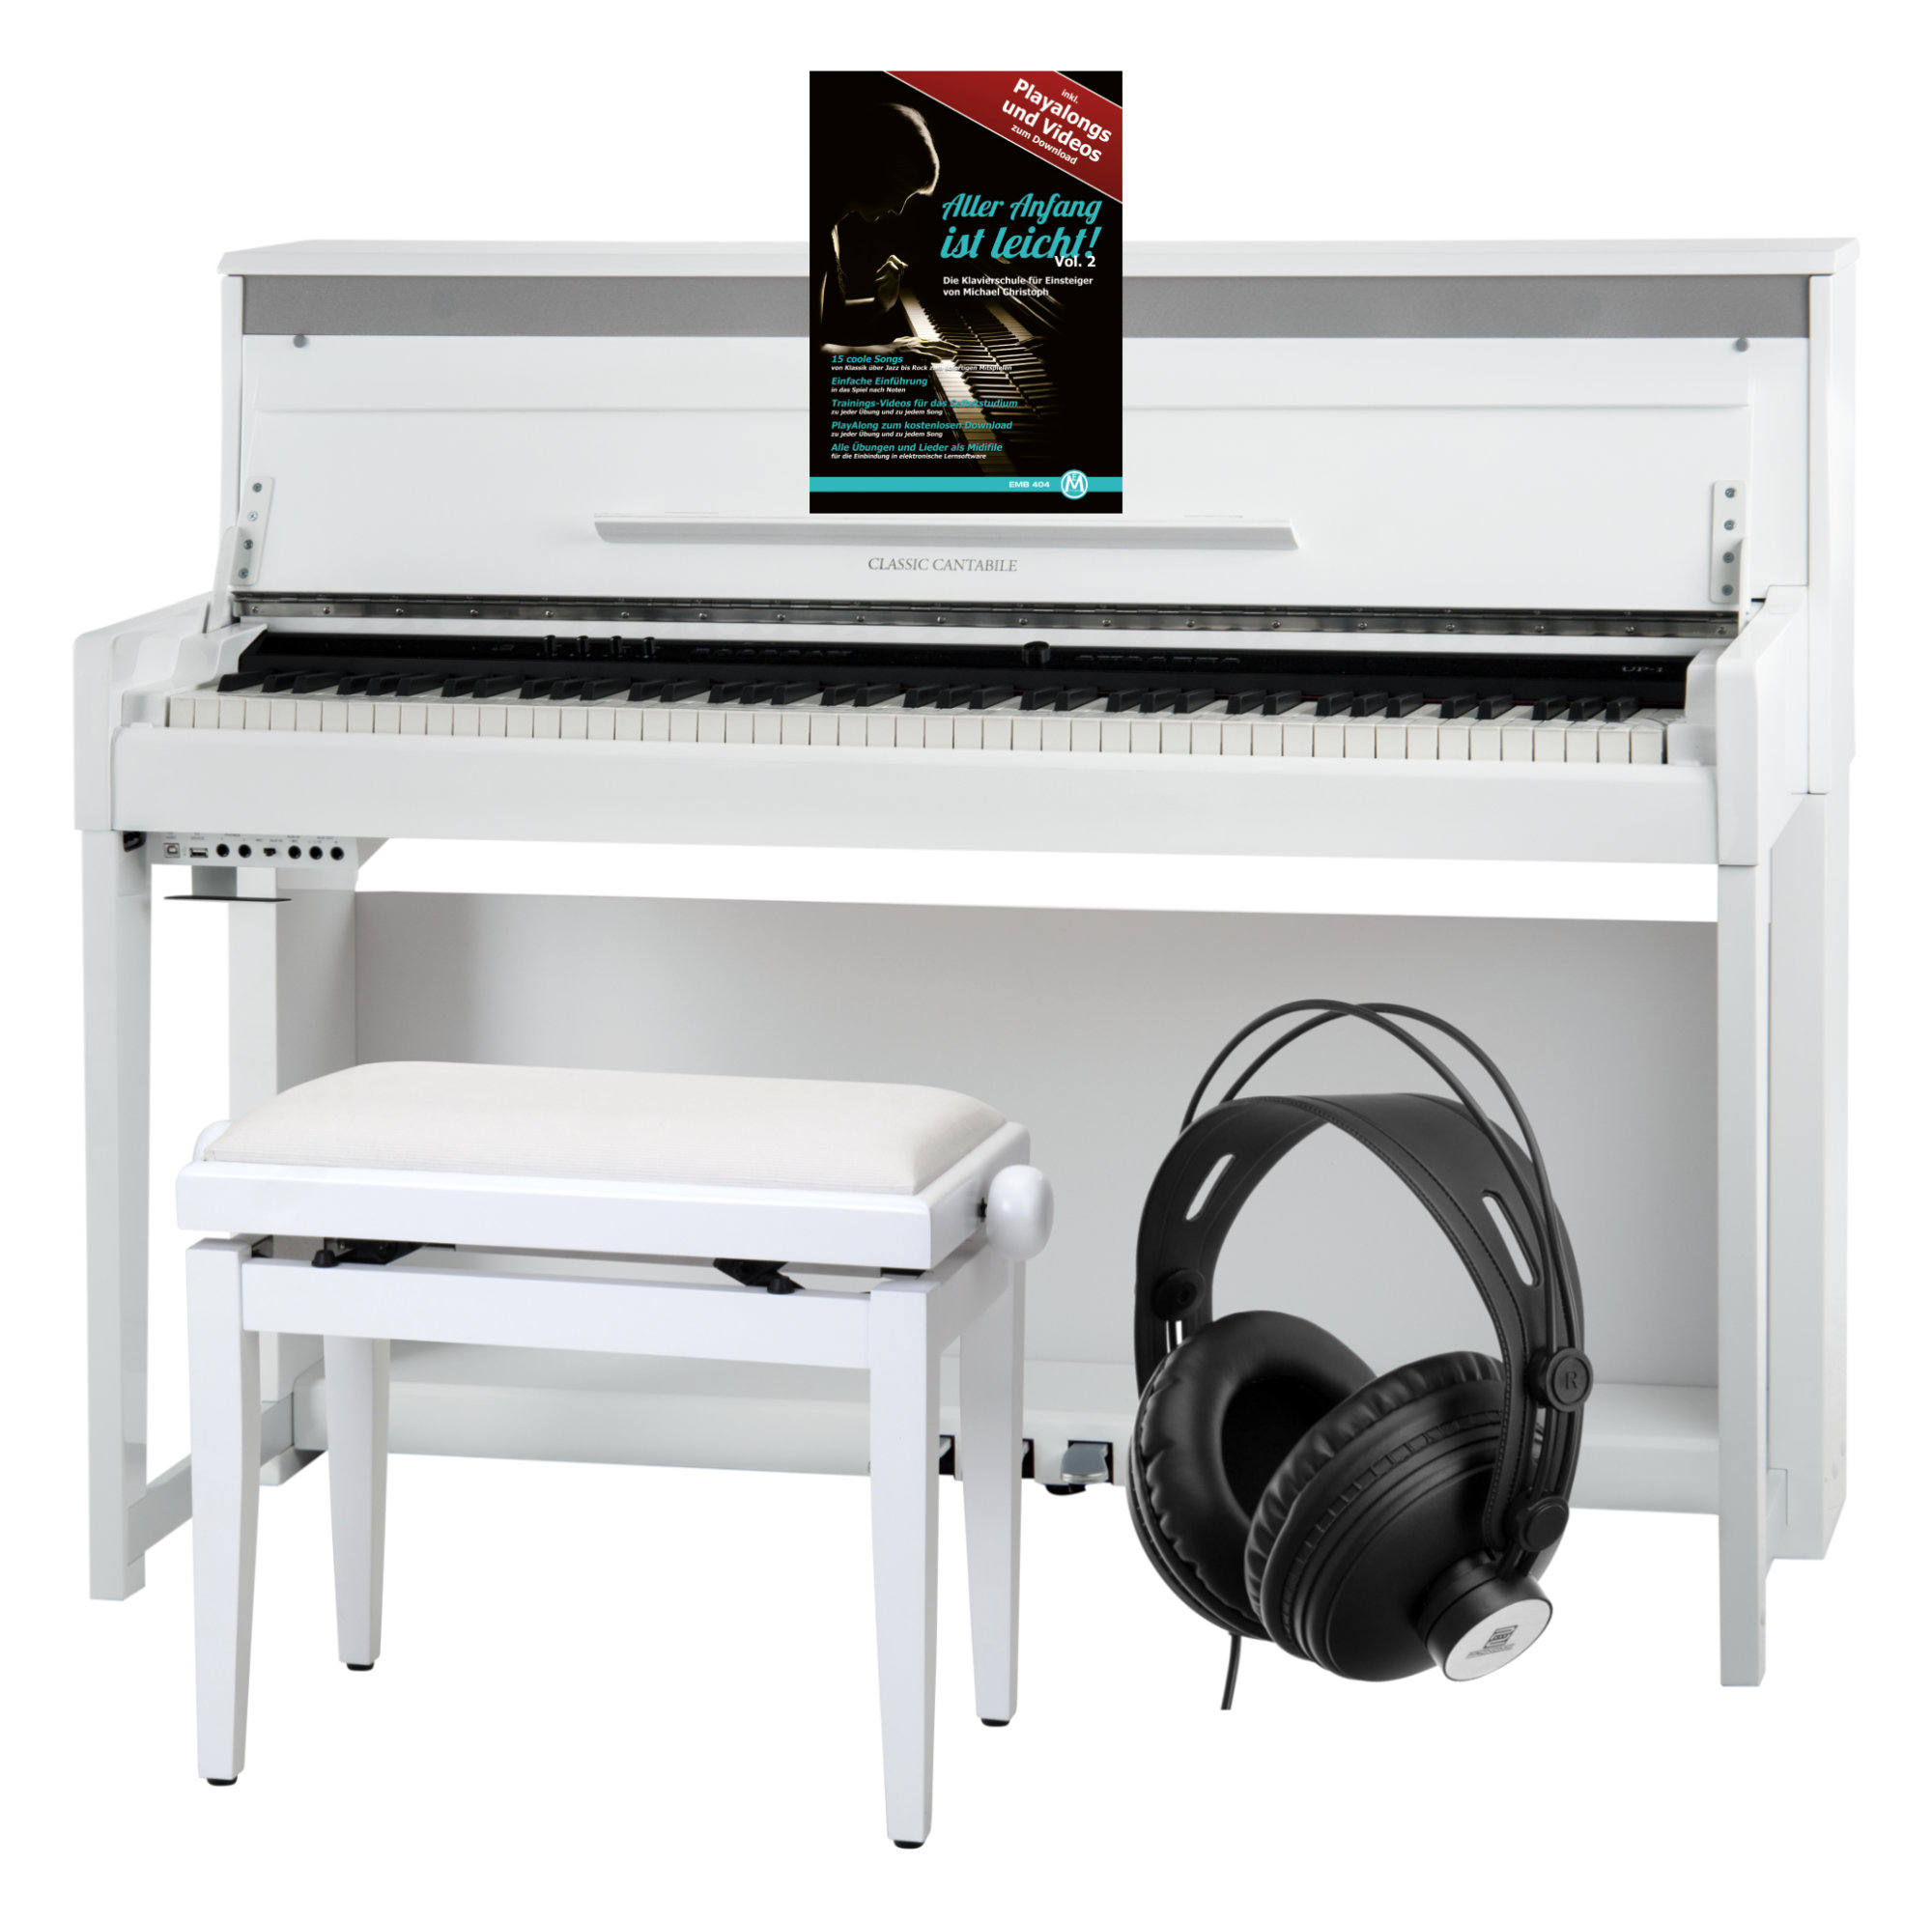 88-Tasten Digital Stage Piano E-Klavier Layer Split Twinova Stagepiano weiß